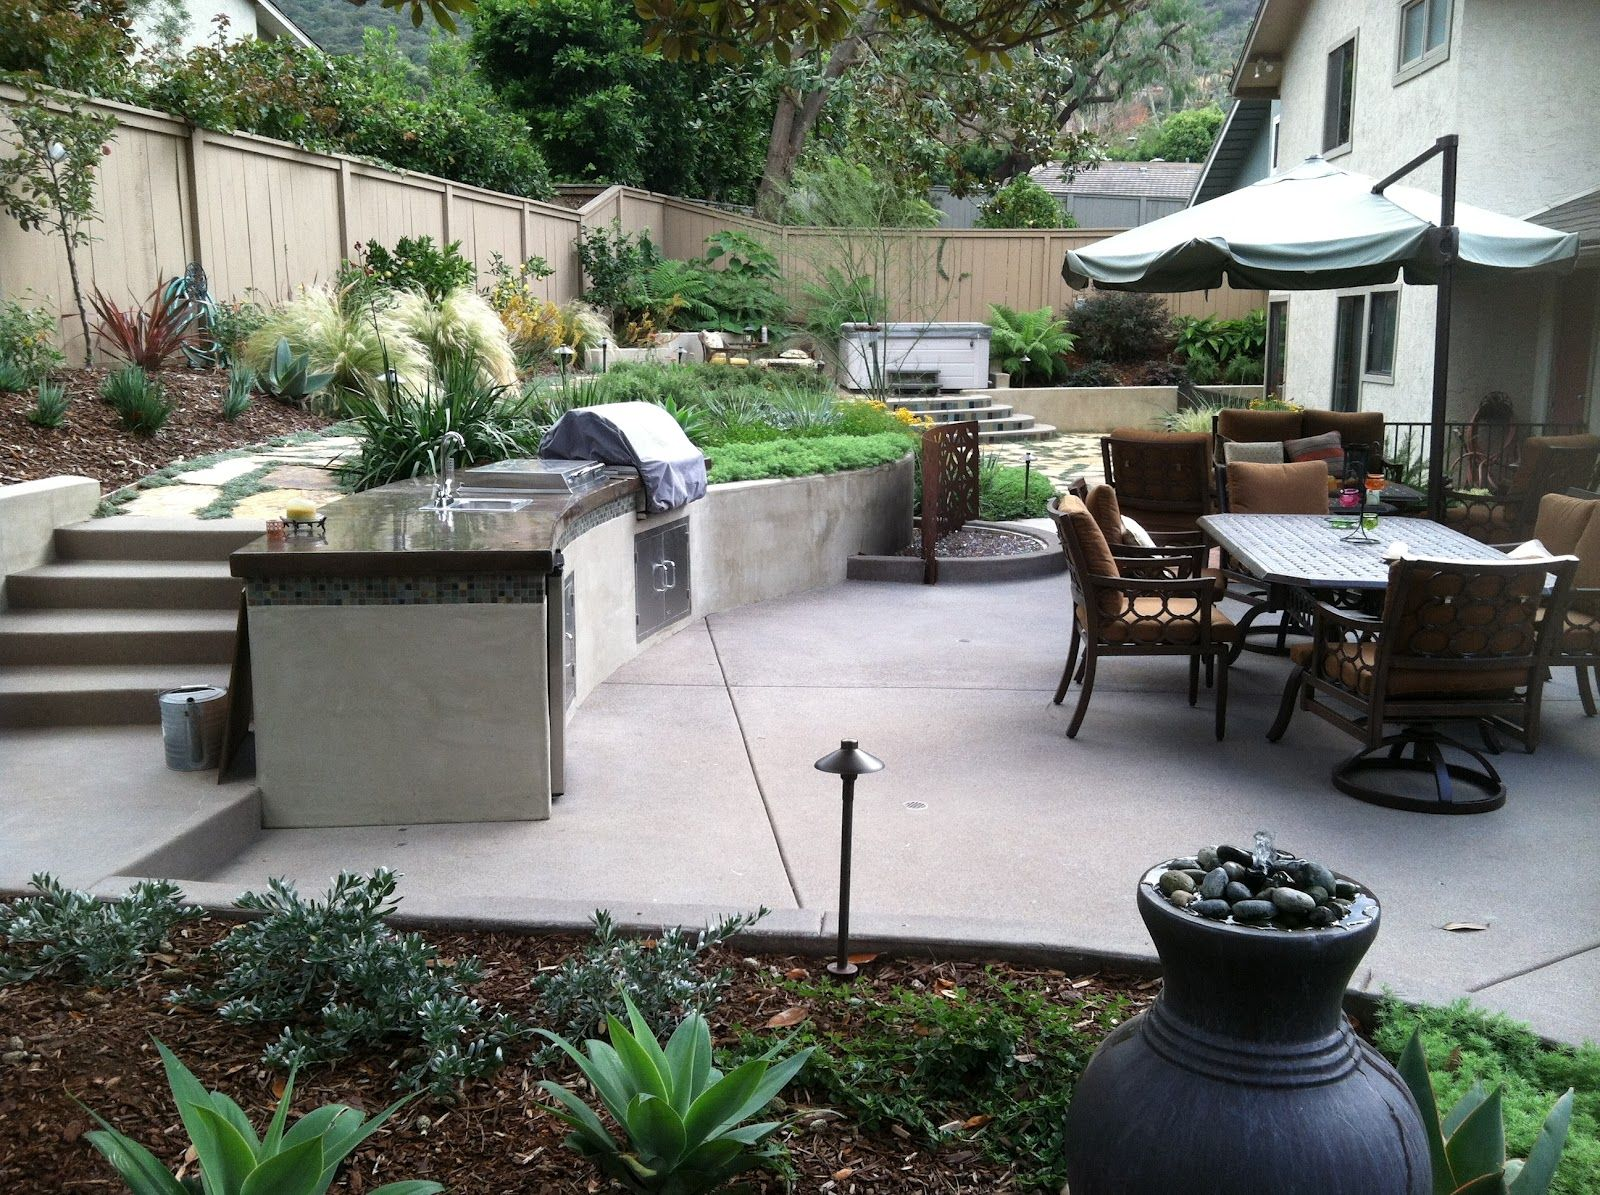 15 modern outdoor kitchen designs for summer relaxation we